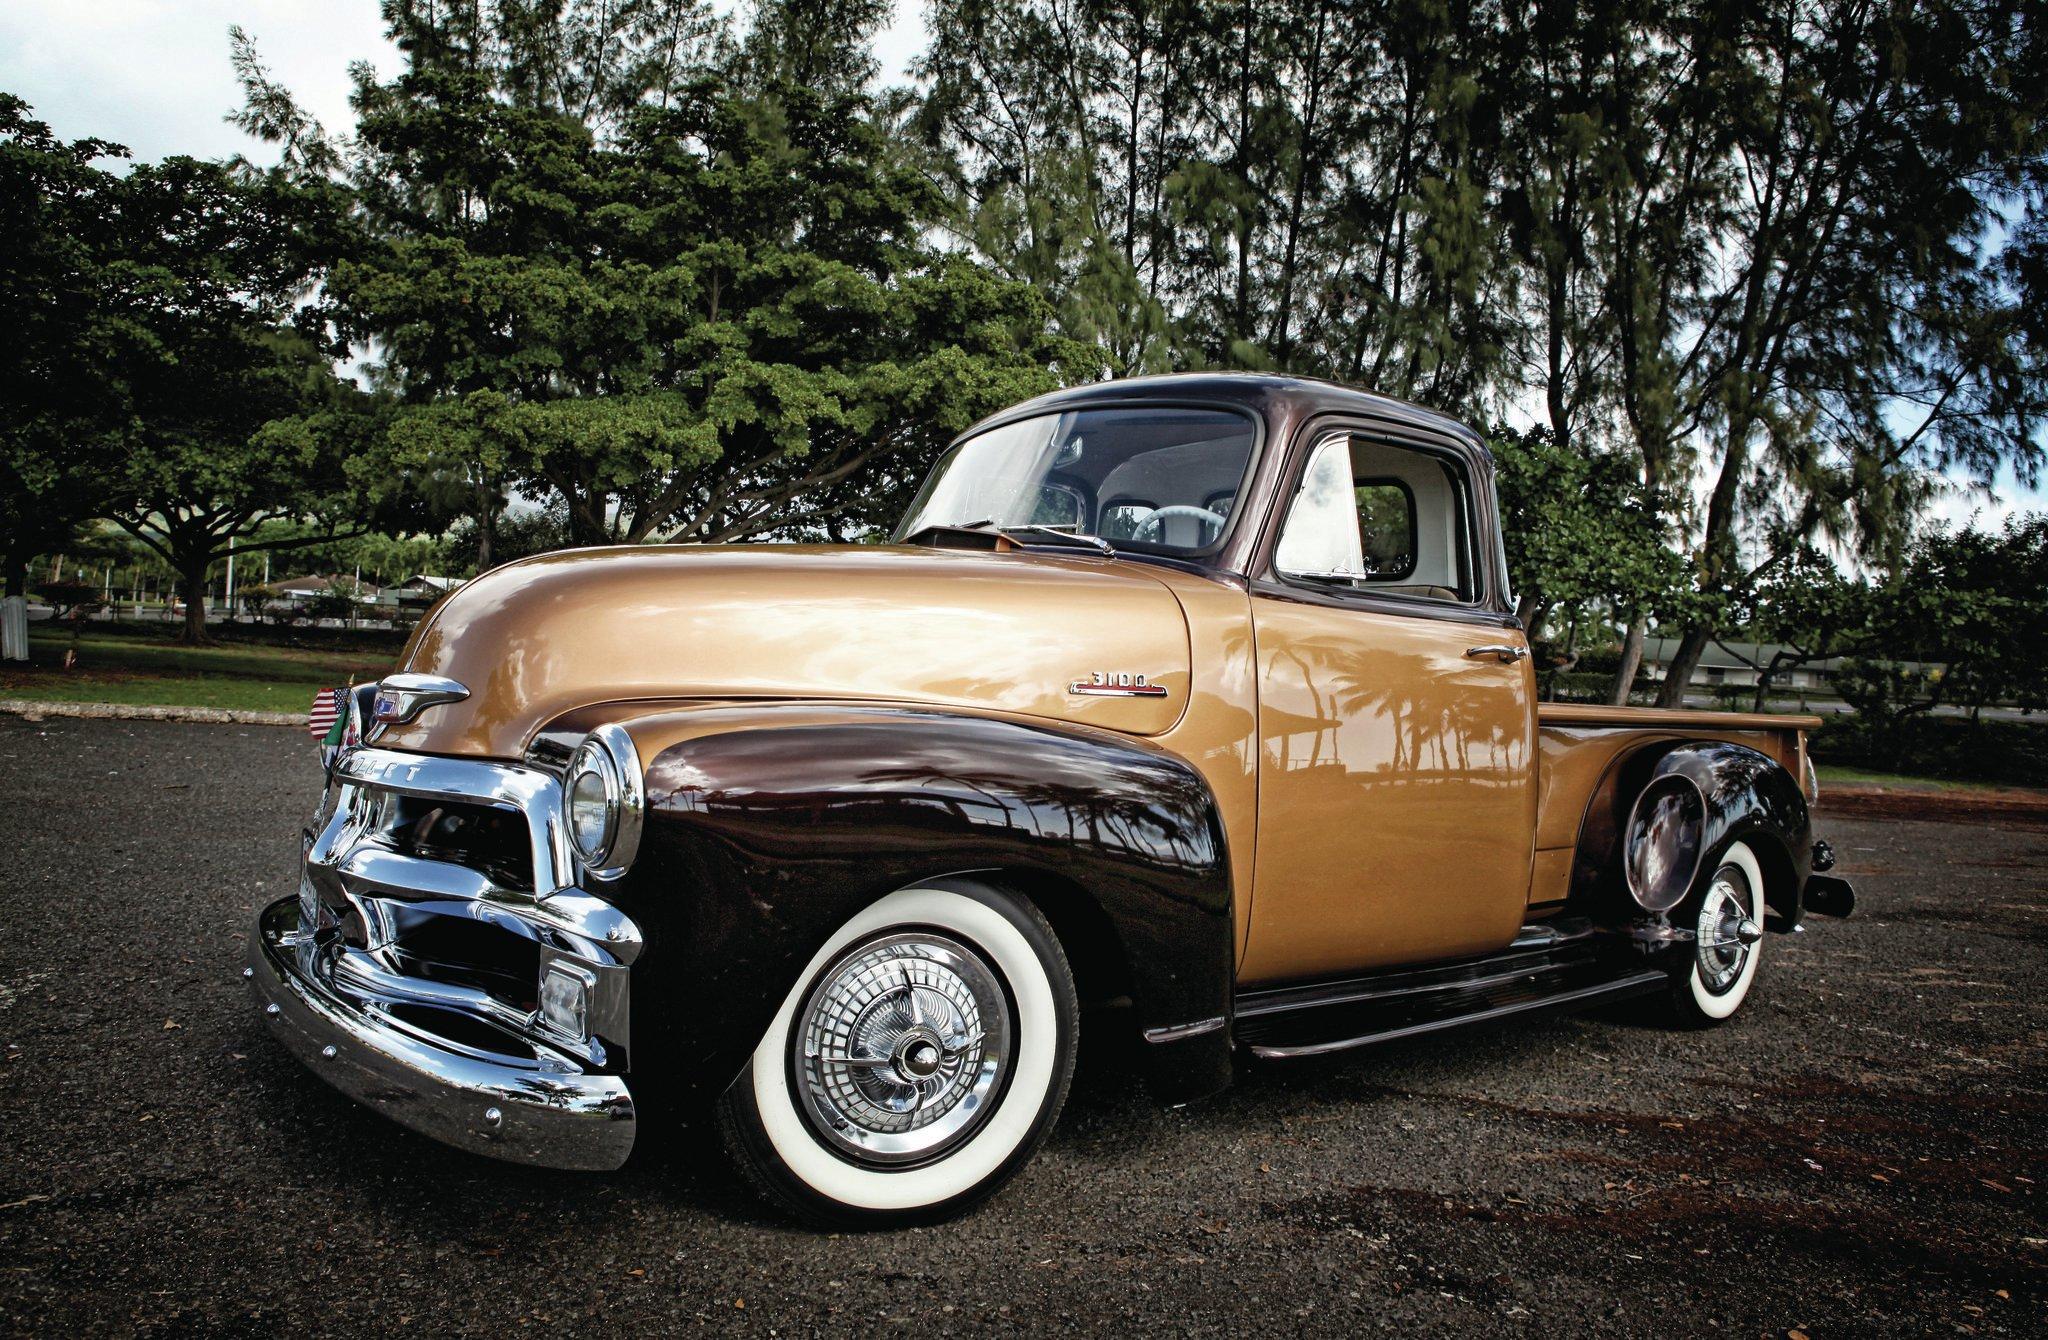 1954 Chevrolet 3100 Hawaiian Stepside Chevy Pickup Truck 2 18